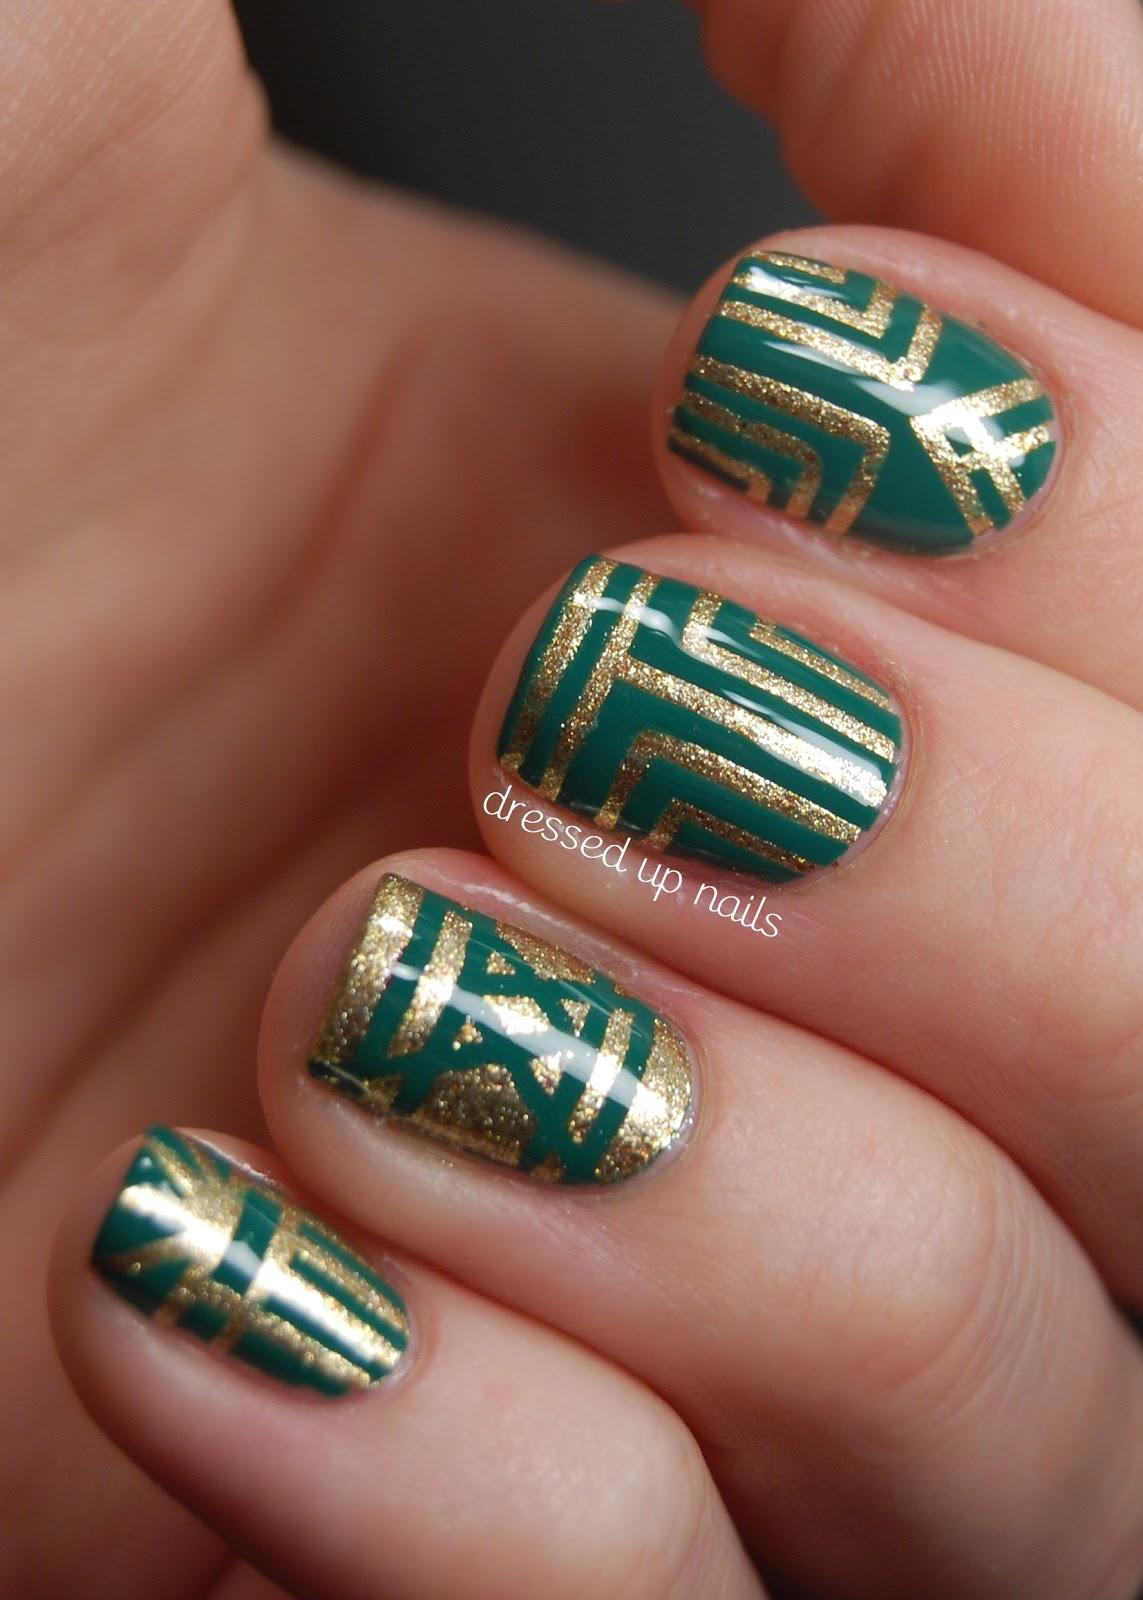 nail art stamp nail art designs. Black Bedroom Furniture Sets. Home Design Ideas